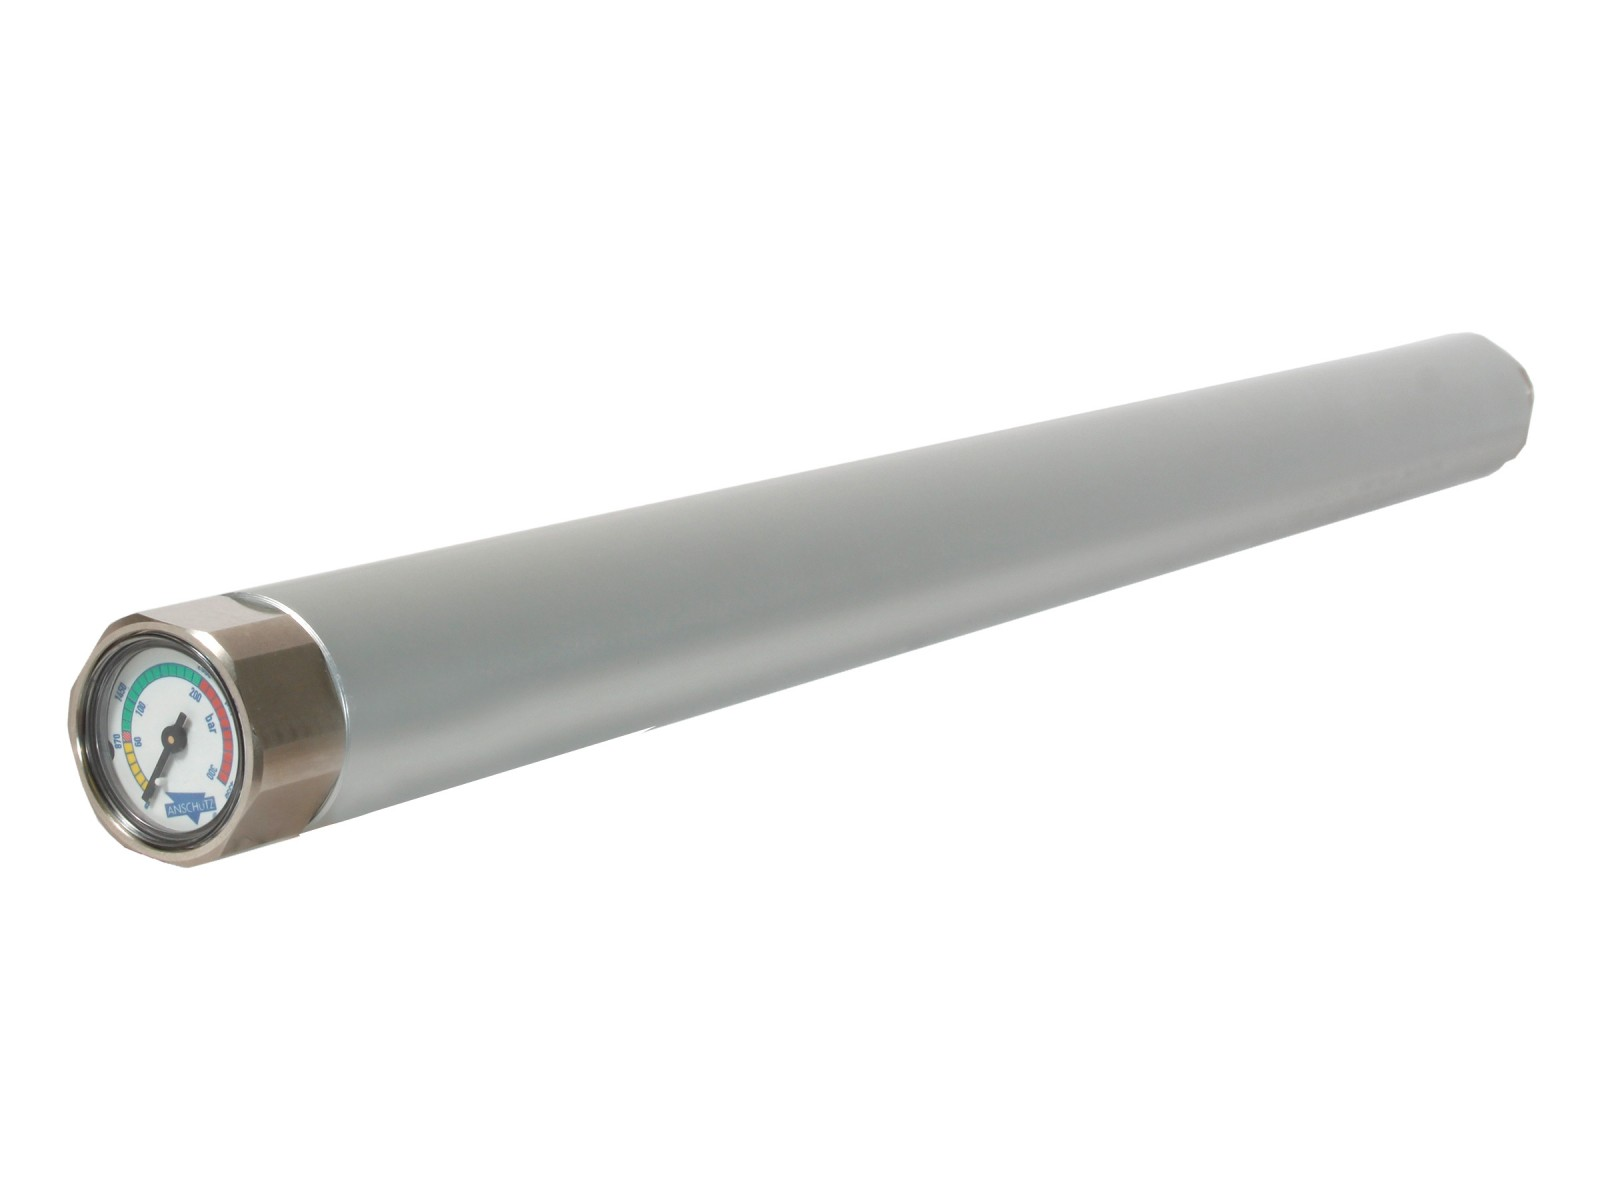 Anschutz Air Cylinder, Aluminum/Silver, Manometer